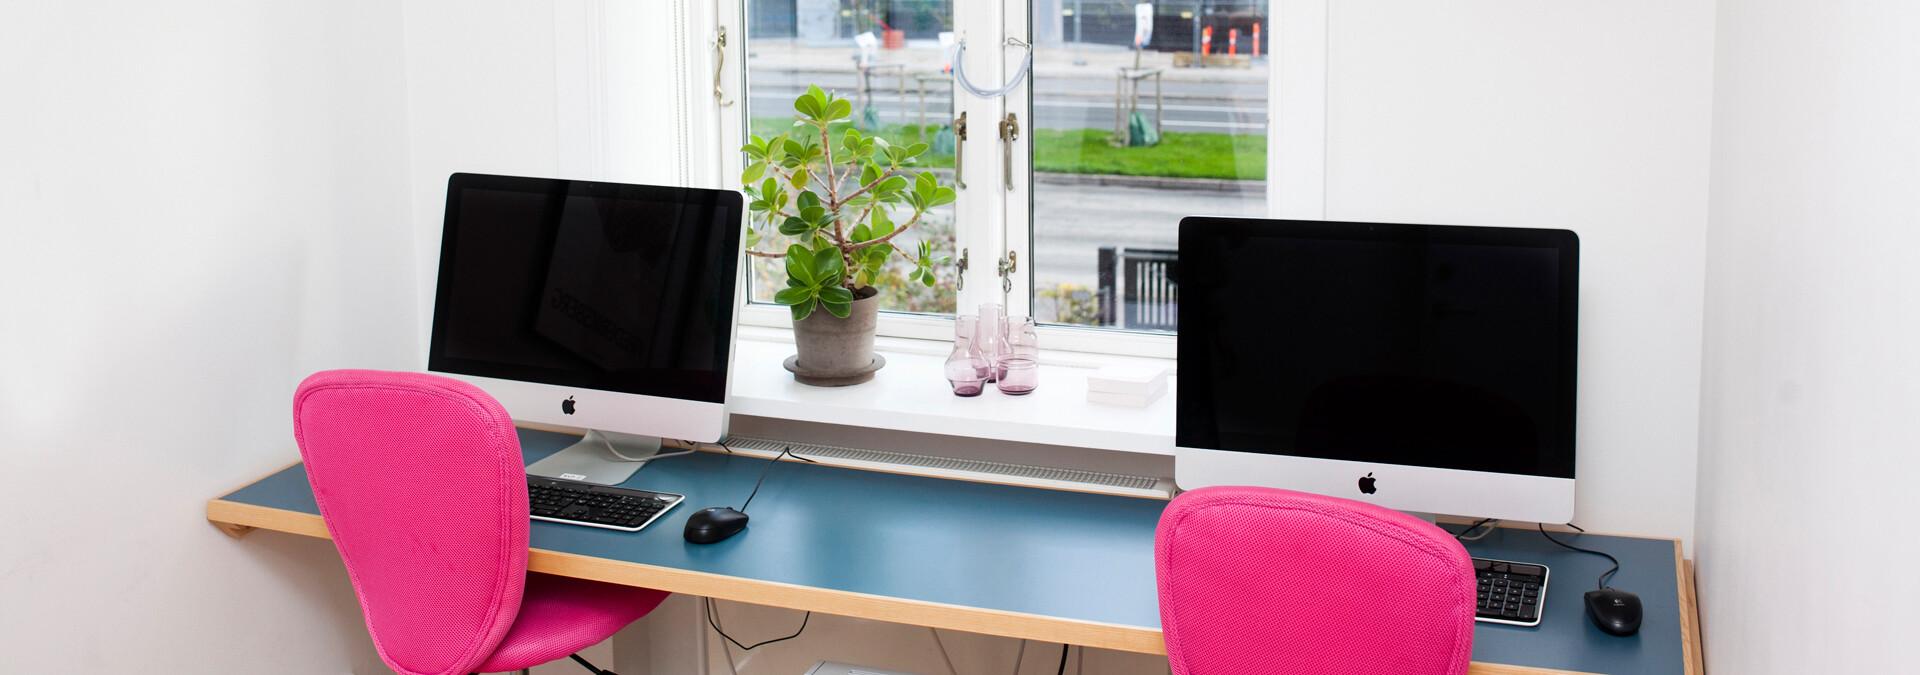 Bord med to computere og et vindue på krisecenter